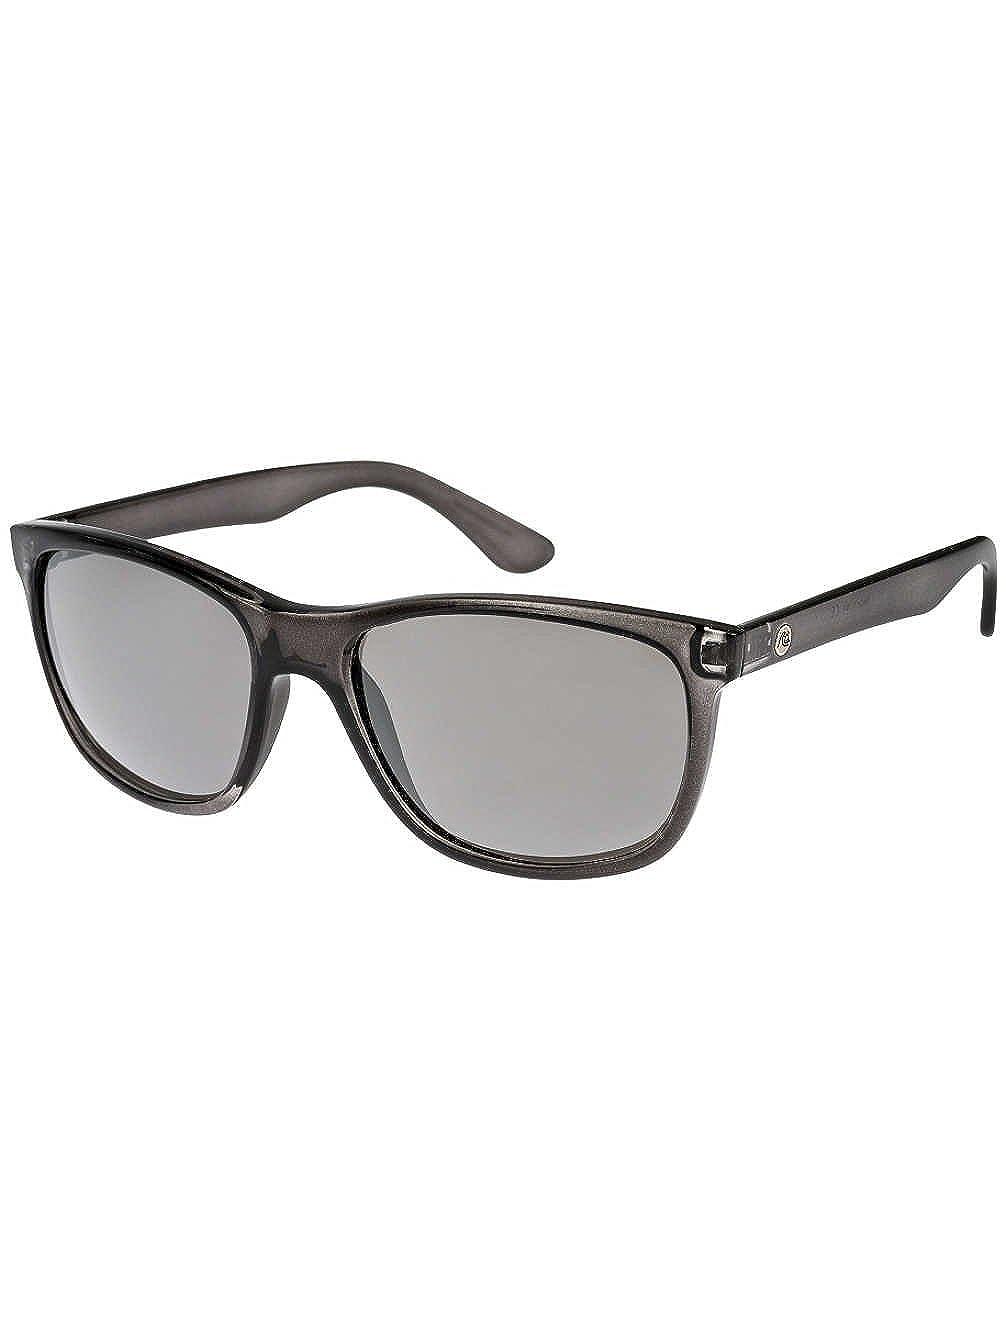 d2412536ad Quiksilver Shoreline - Sunglasses - Sunglasses - Men - ONE SIZE - Grey   Amazon.co.uk  Clothing